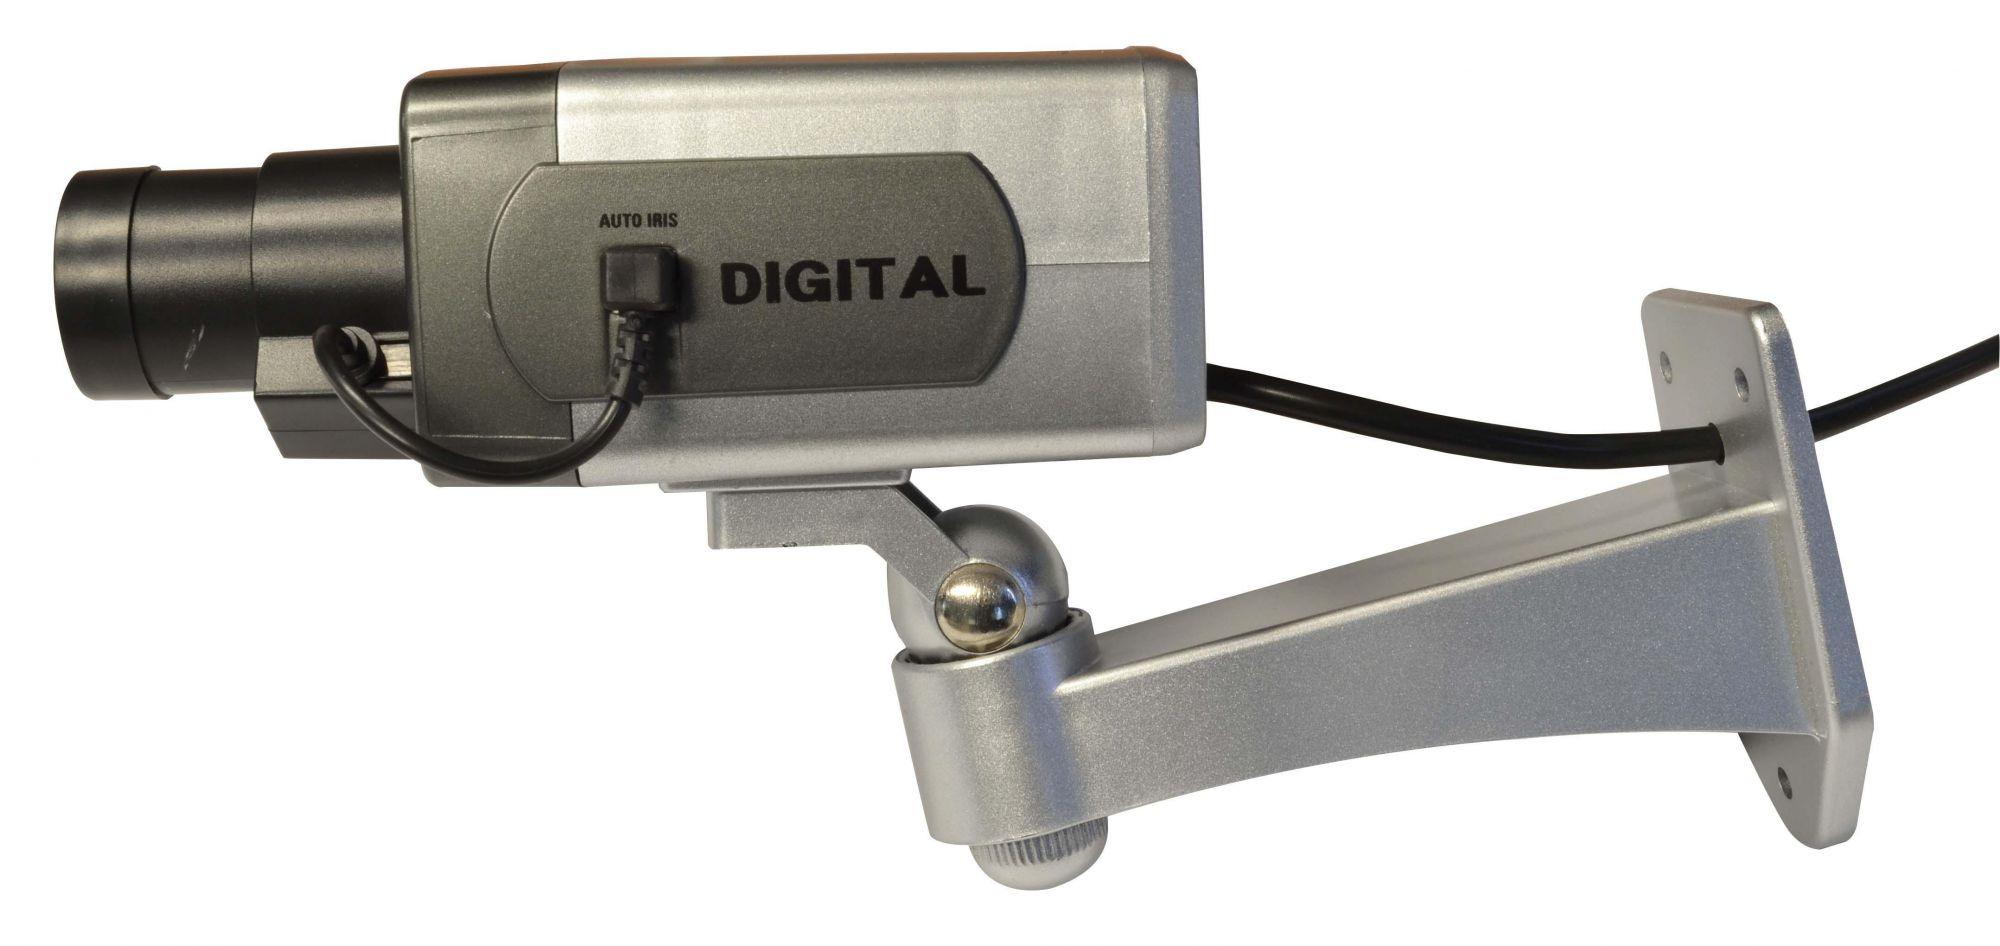 Camera Factice Format Box Avec Objectif (UCAMFACT)